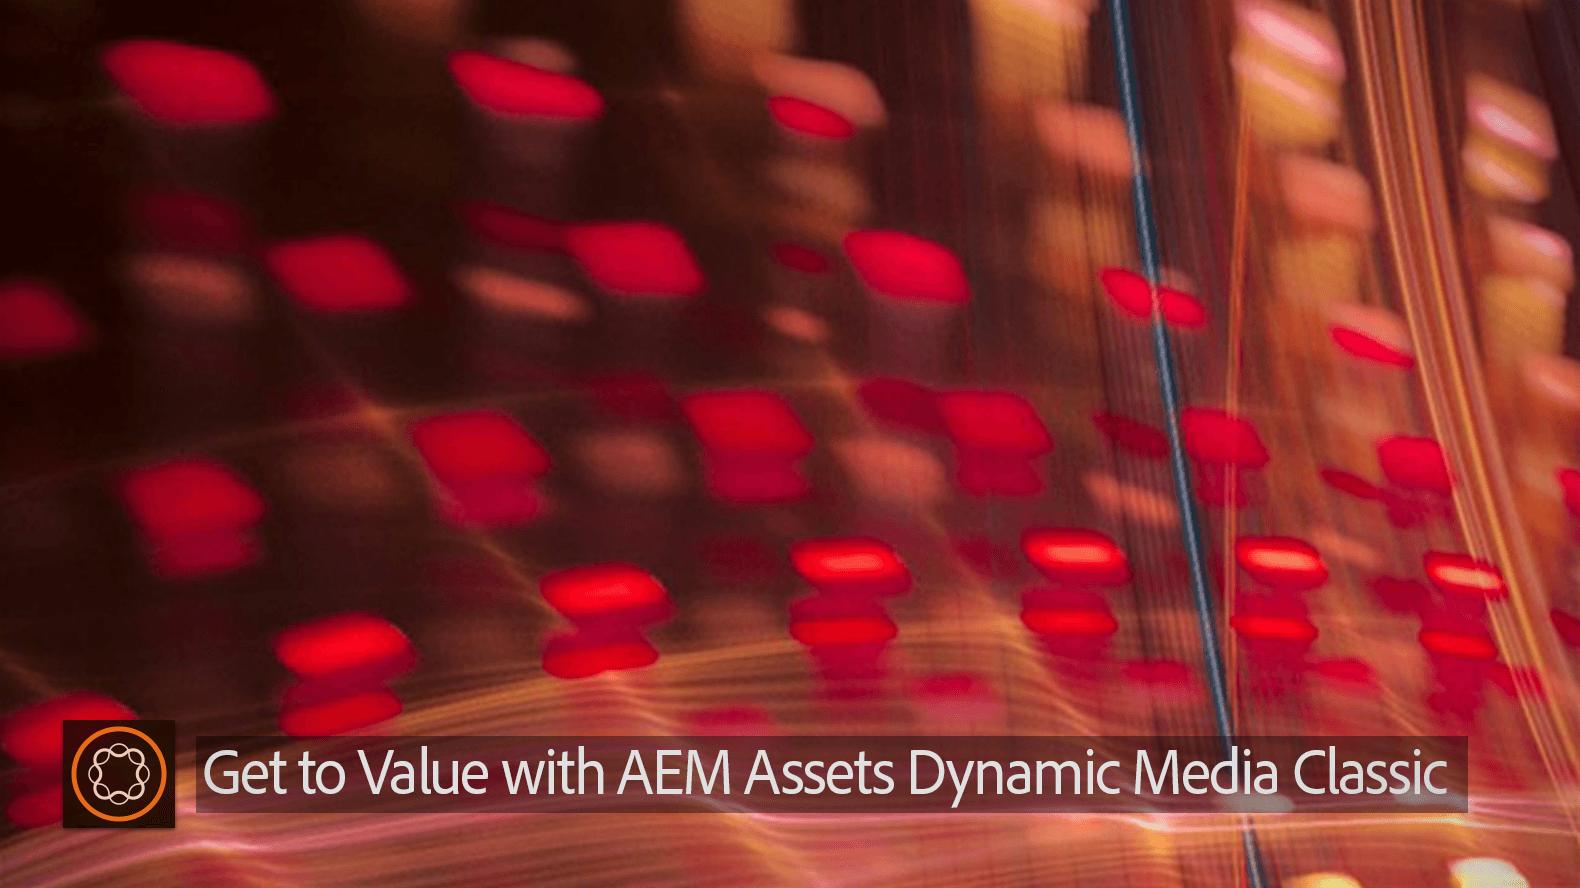 aem-assets-dmc.png